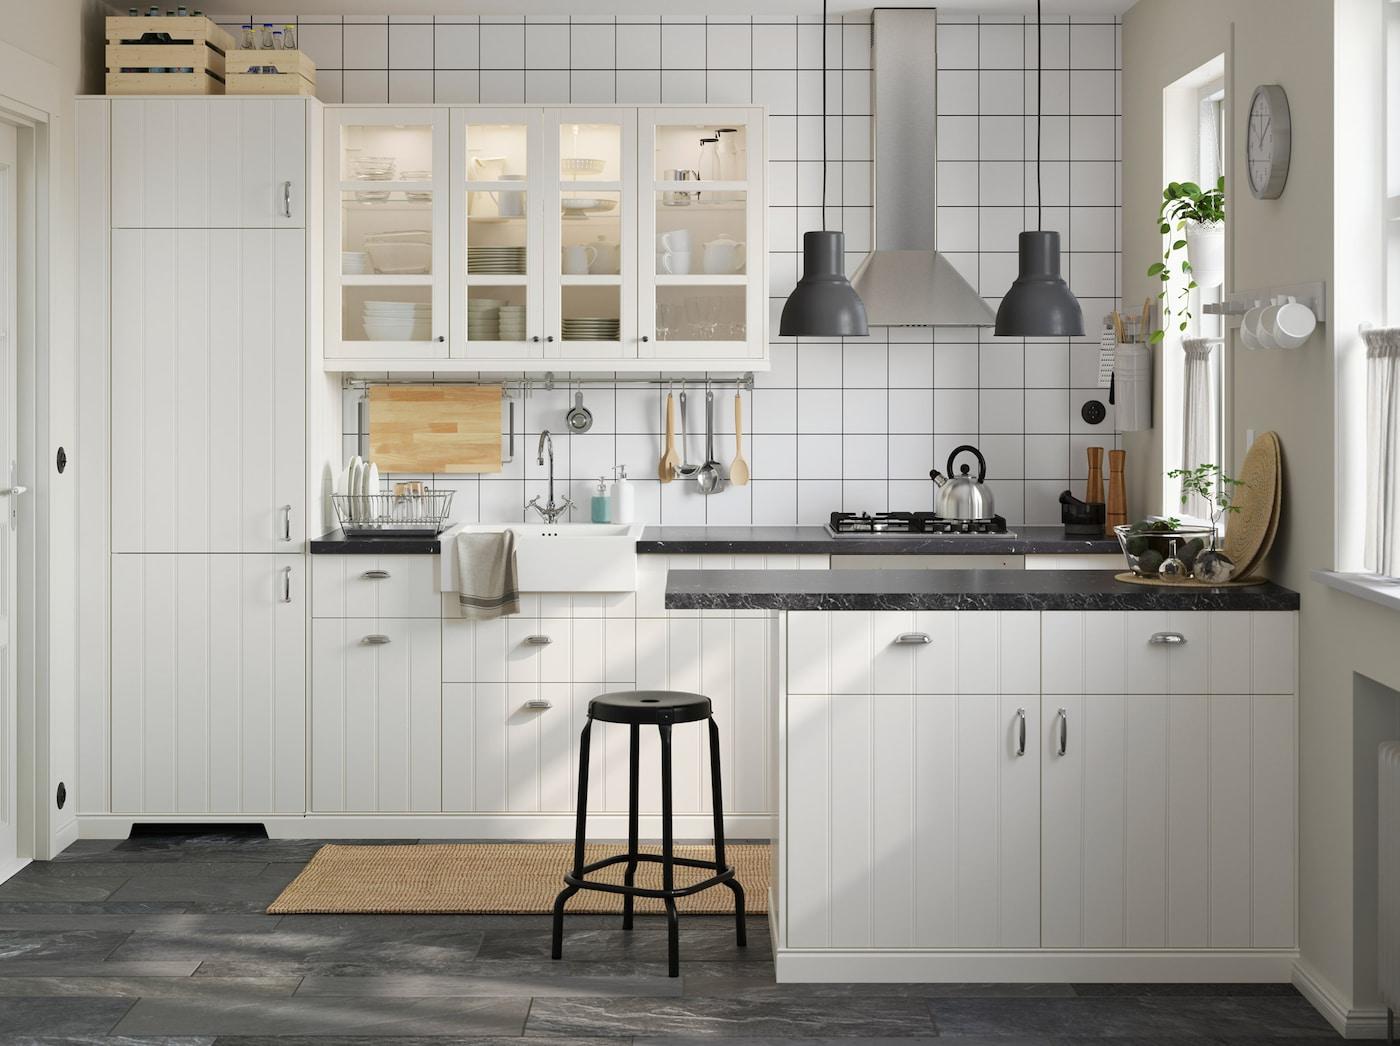 Za Onemogocanje Vsi Vojni Ikea Keukenkasten Wit M Style Aroma Com